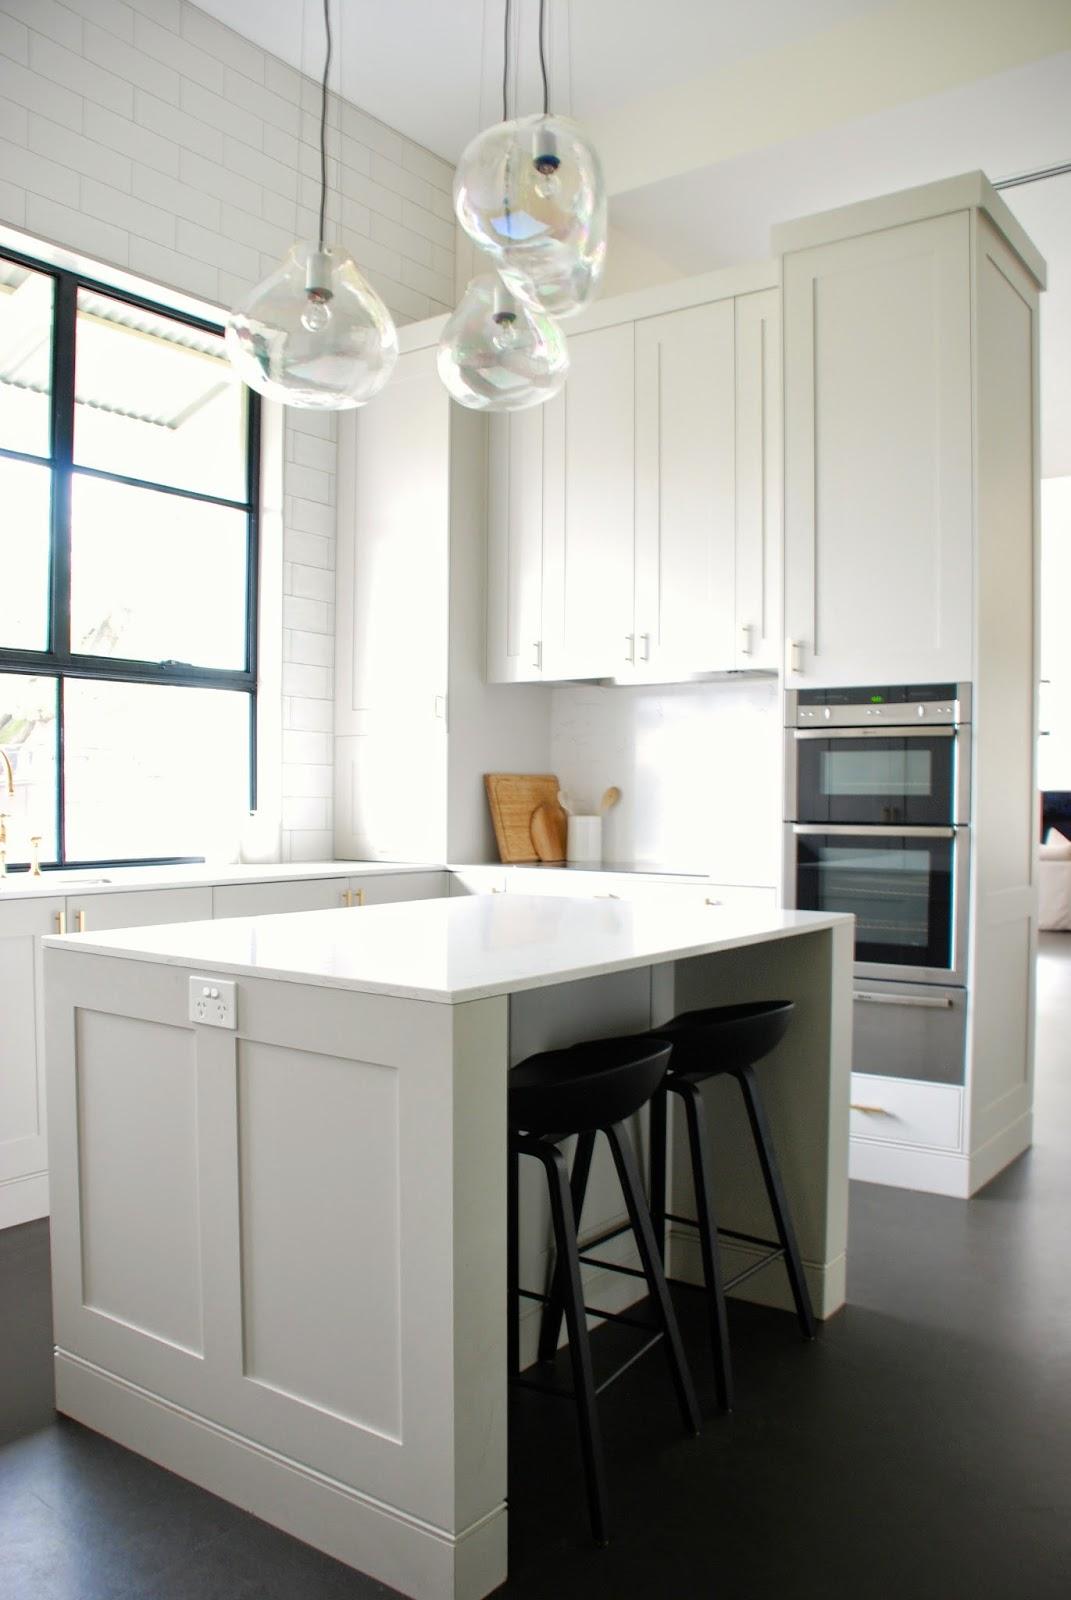 Adelaide Villa: Renovation - The finished Kitchen